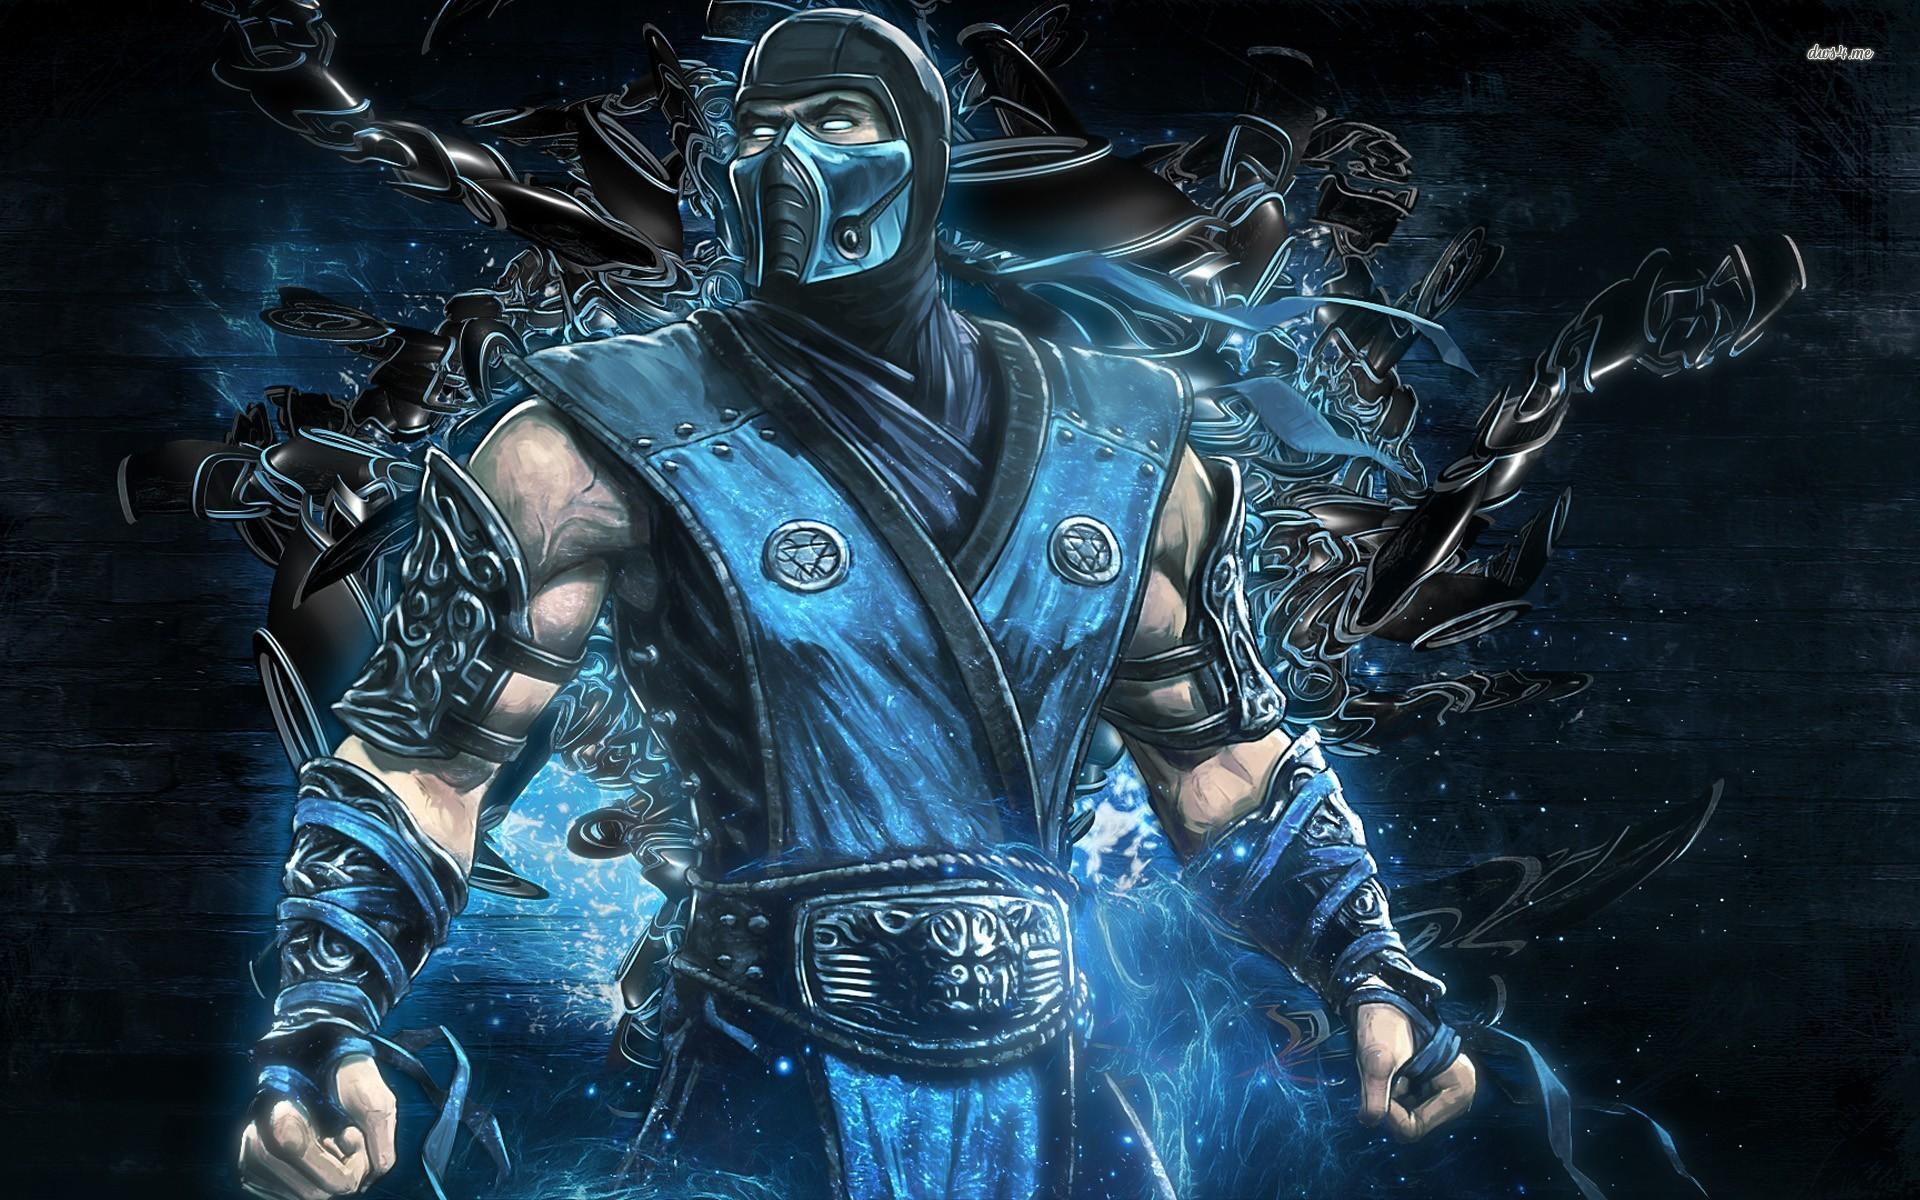 Mortal Kombat Hd Wallpaper Wallpapertag